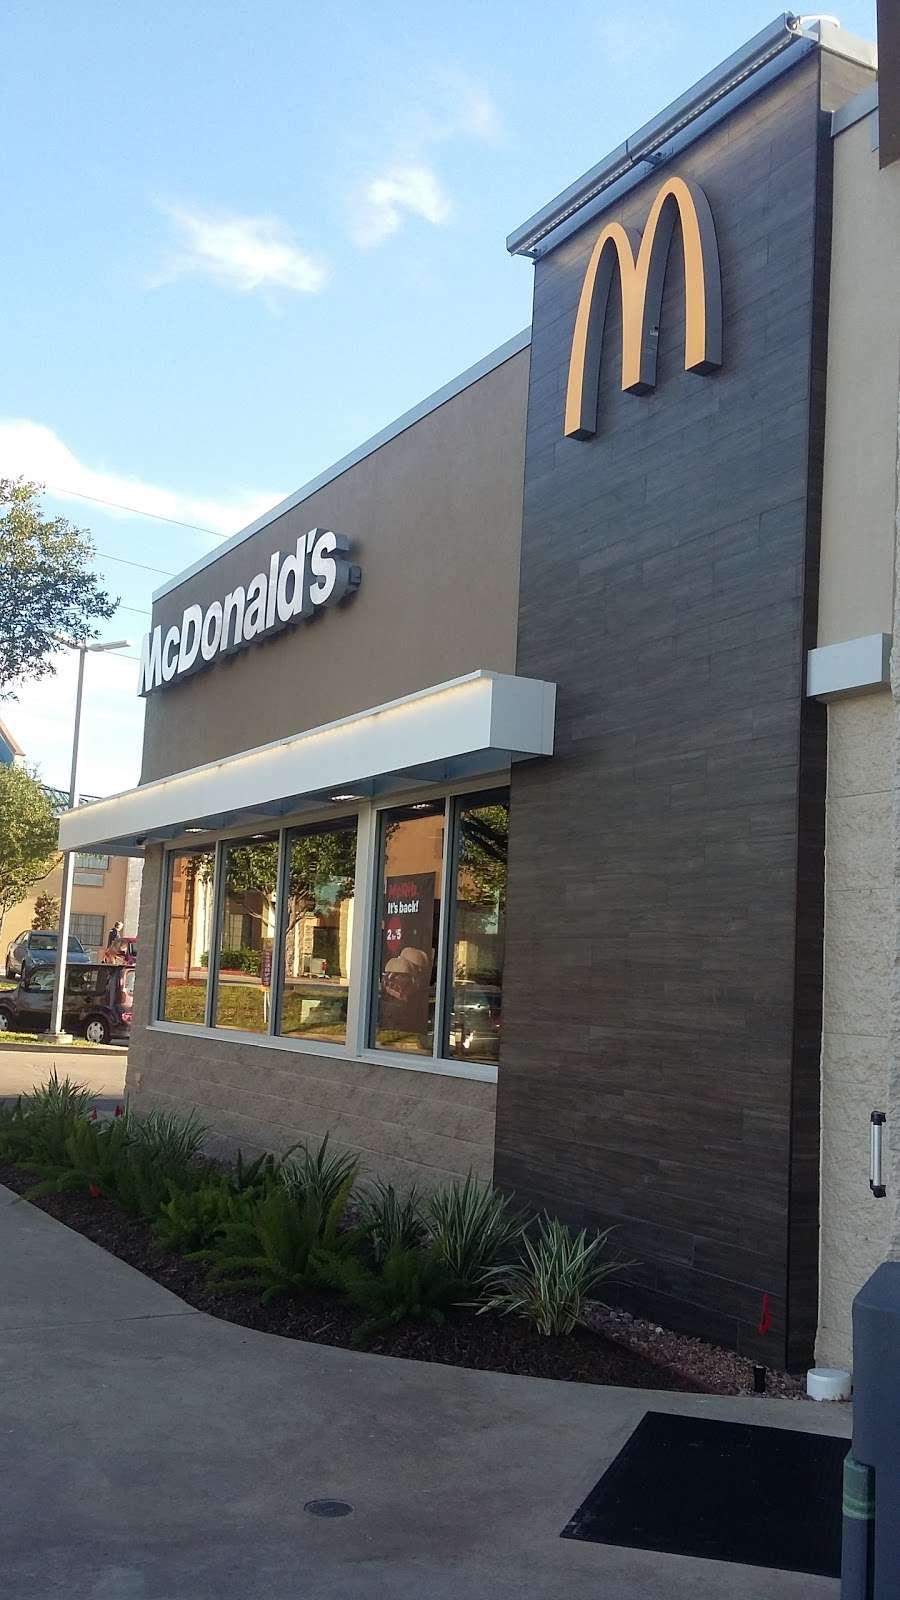 McDonalds - cafe  | Photo 2 of 10 | Address: 1200 League Line Rd, Conroe, TX 77303, USA | Phone: (936) 856-7716